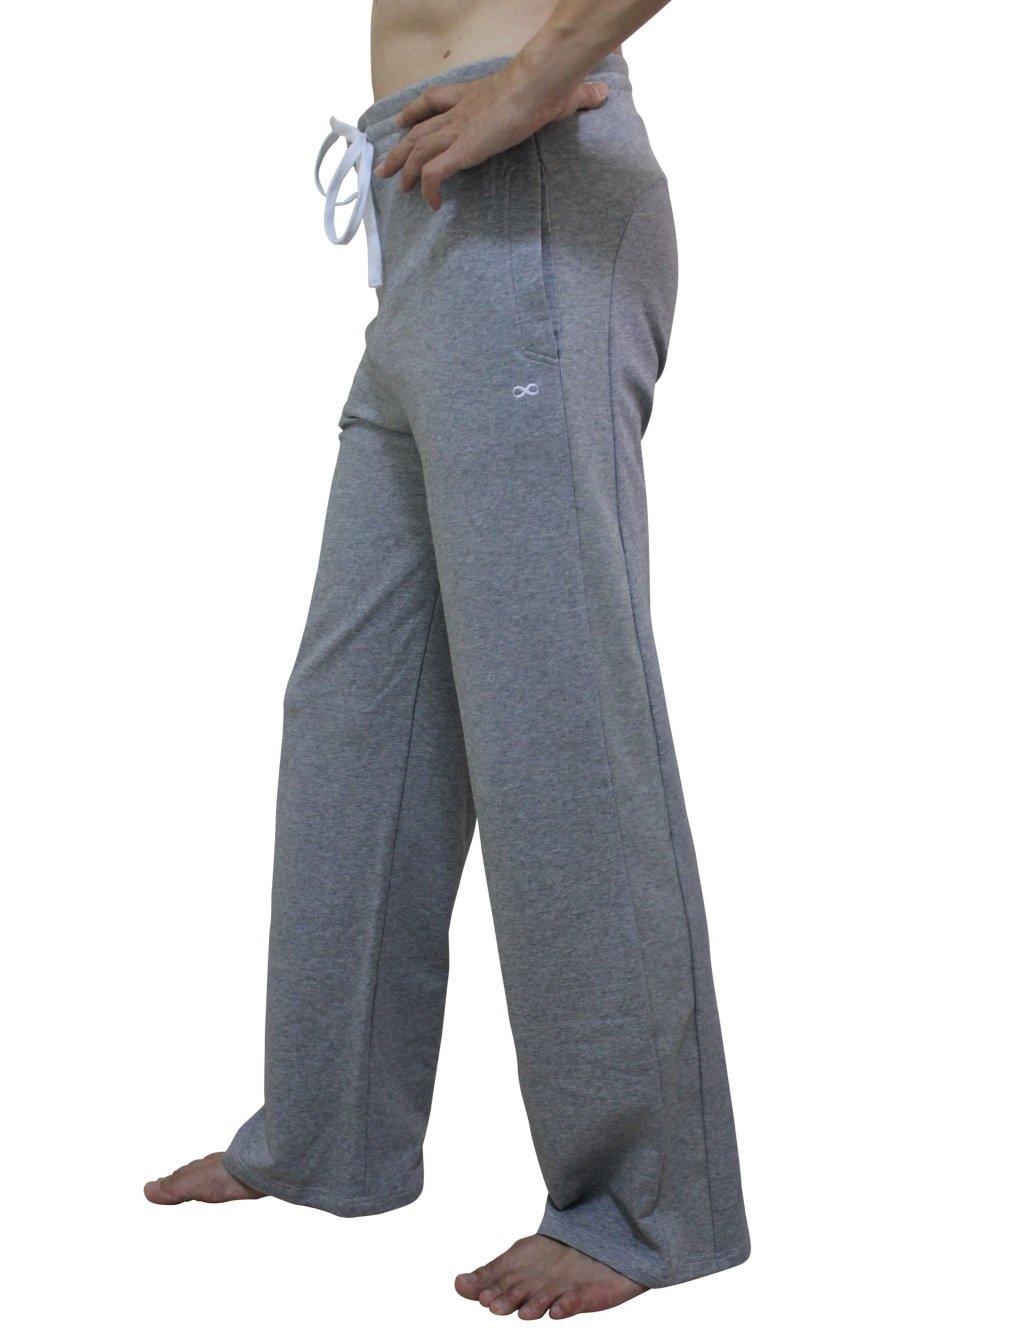 YogaAddict Men Yoga Long Pants, Pilates, Fitness, Workout, Casual, Lounge, Sleep, Martial Arts Pants (Sale Price), Light Grey - Size S by YogaAddict